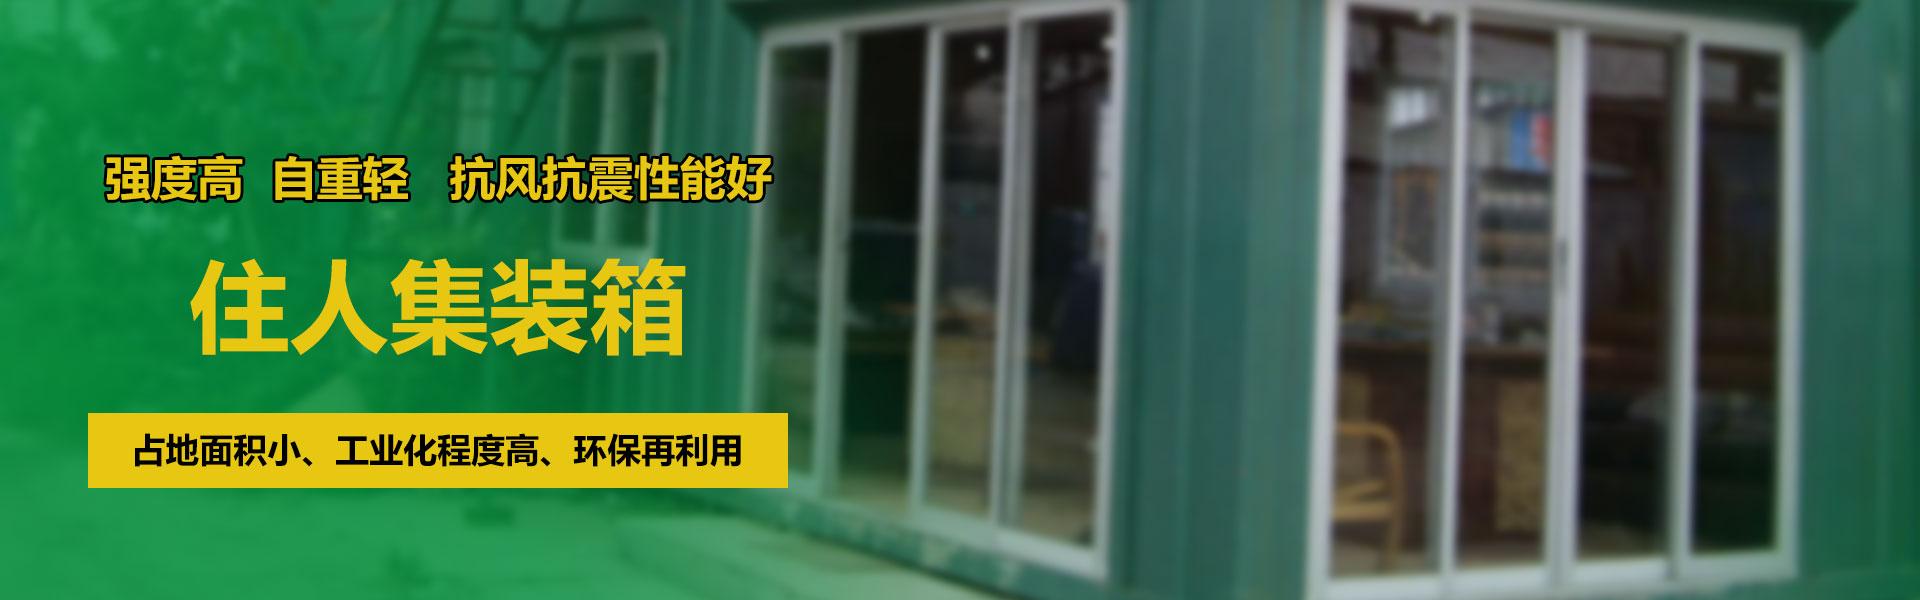 betway登陆网址banner2.jpg